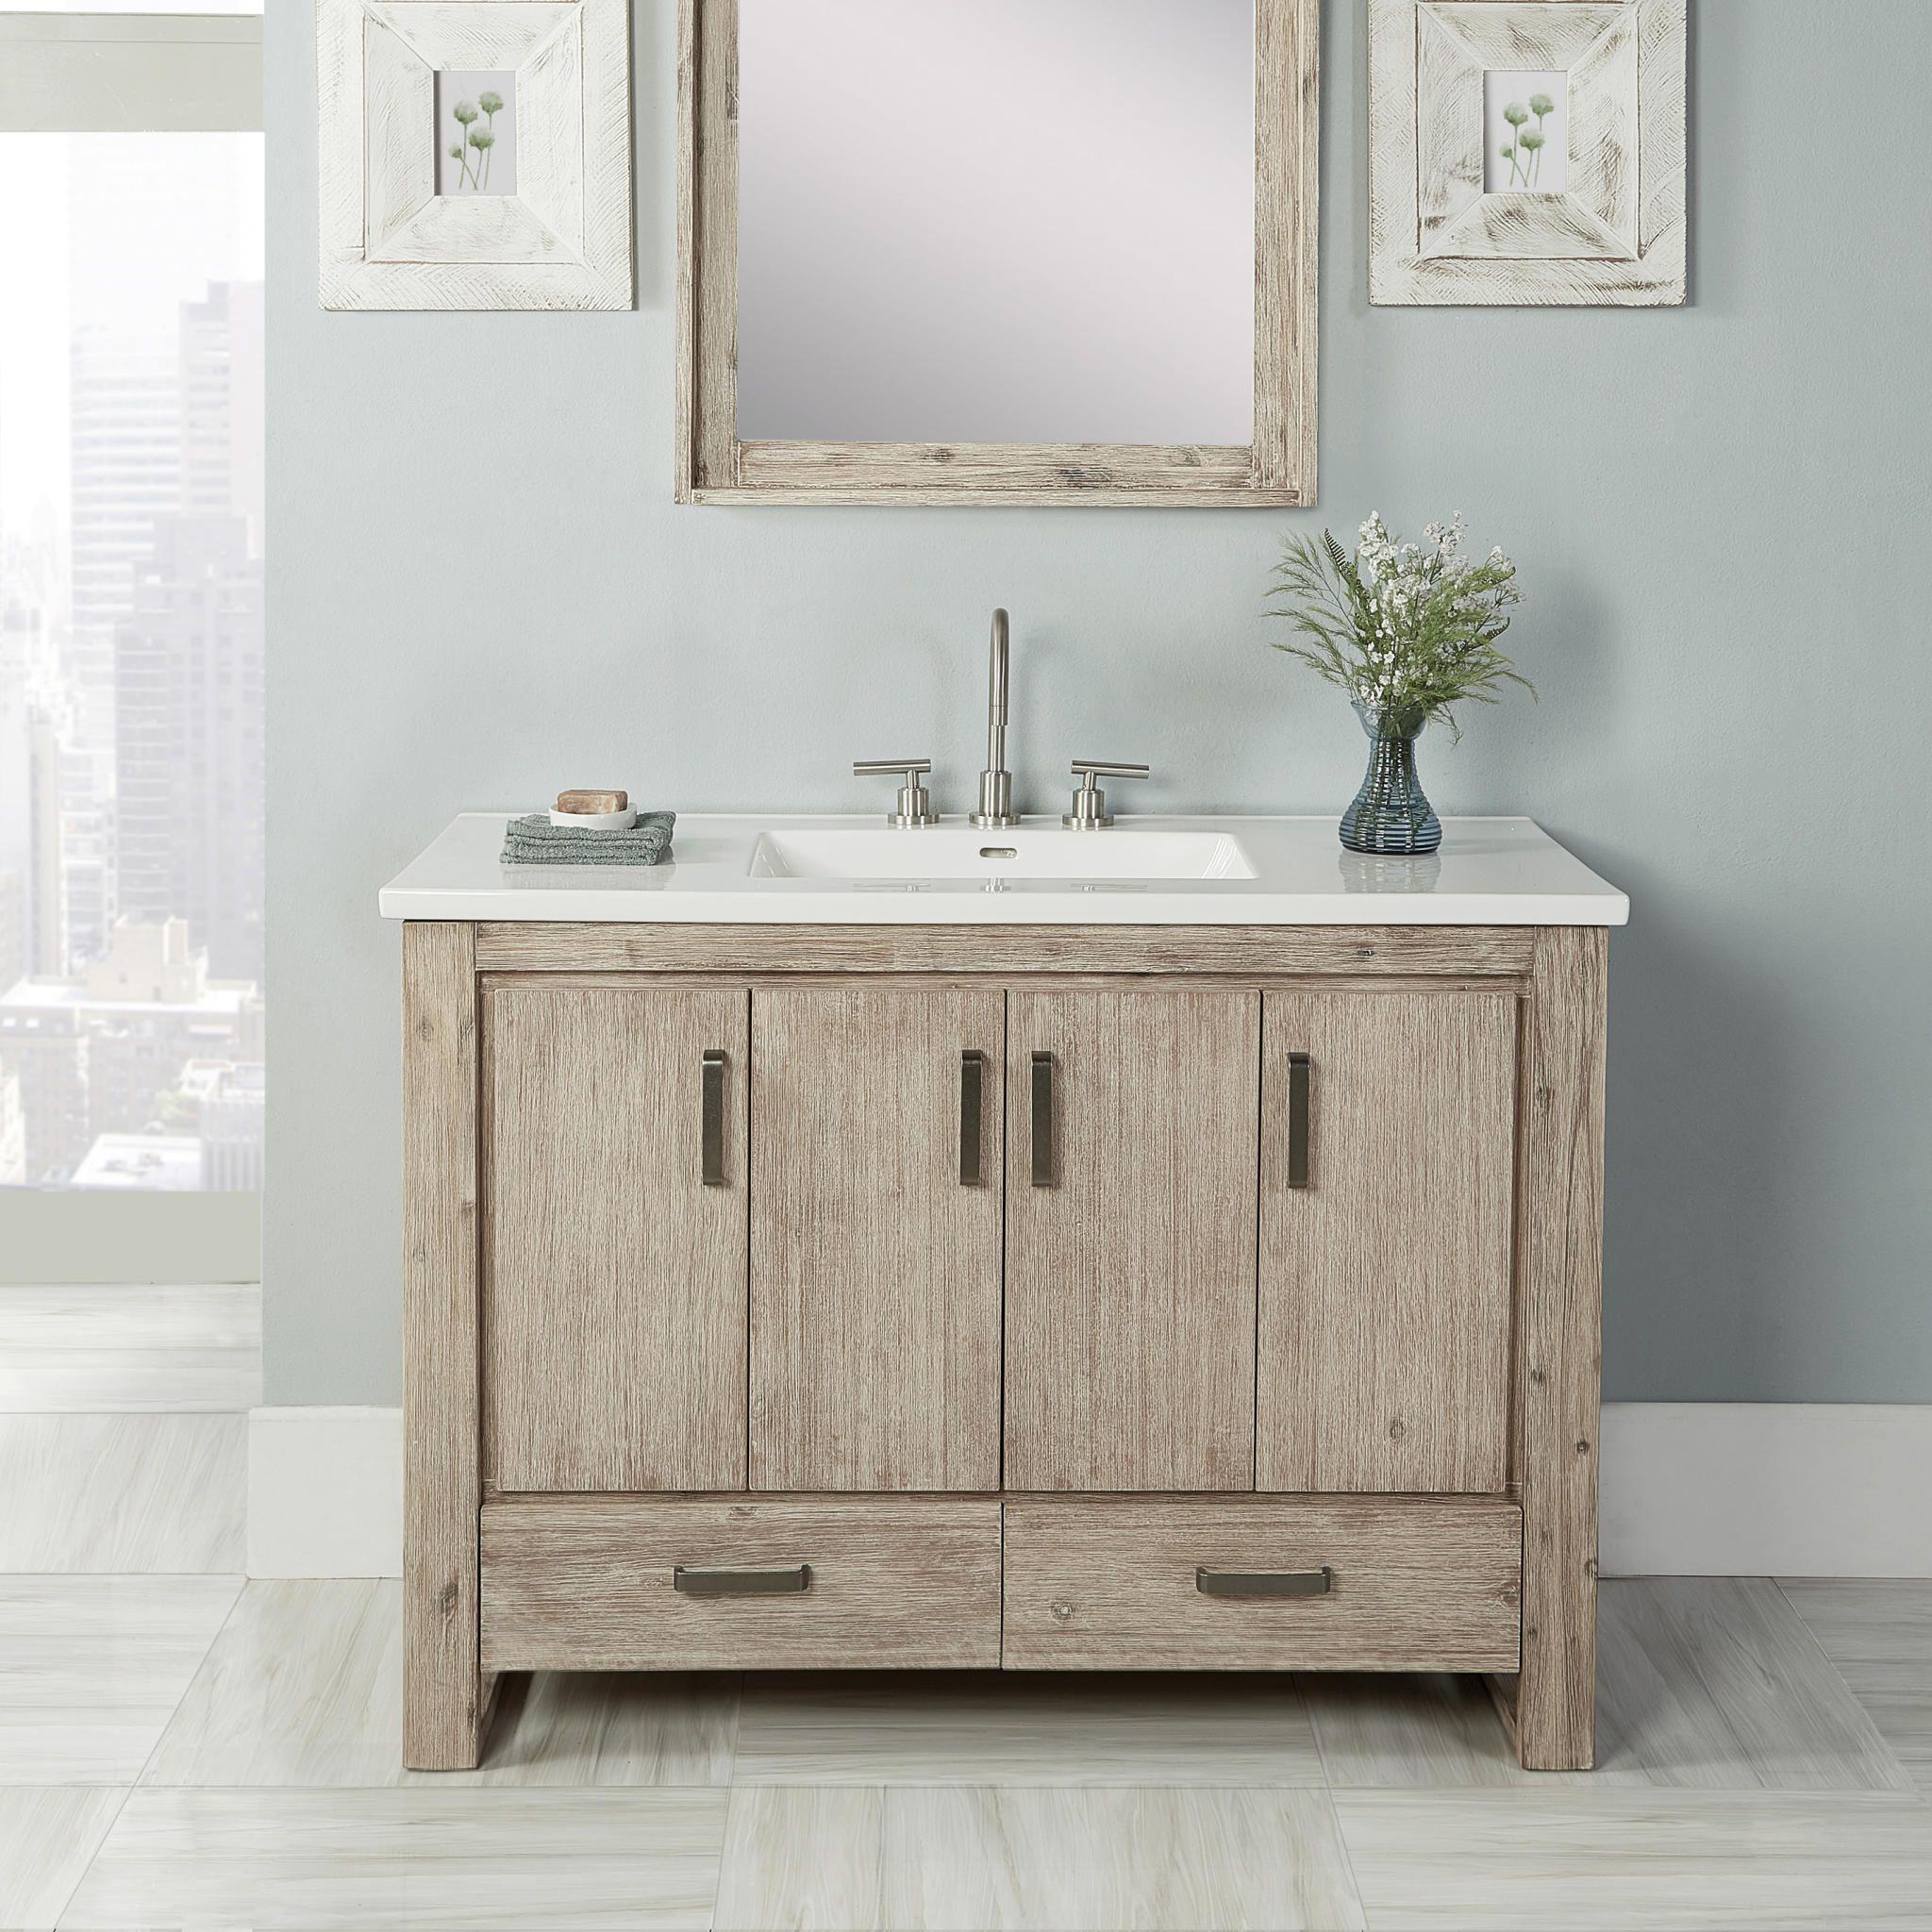 Oasis Bathroom Vanity | Master Bath | Pinterest | Bathroom vanities ...